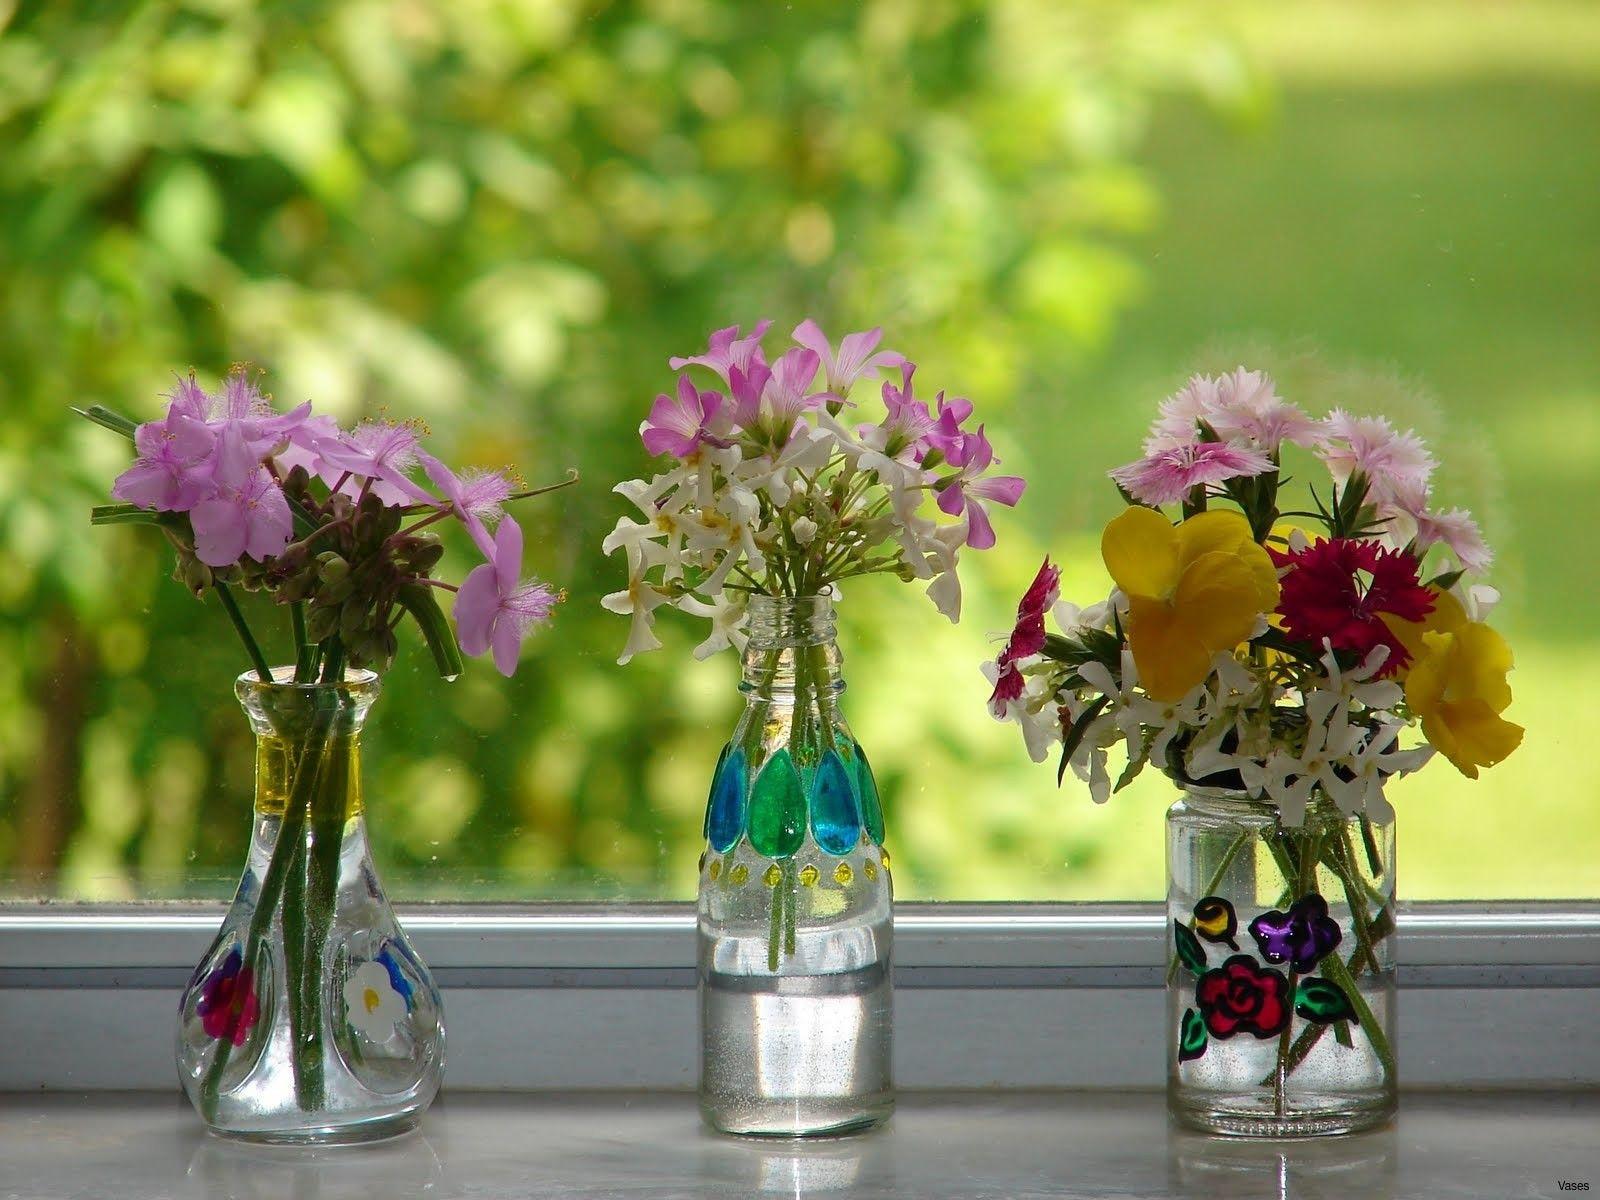 flower vase michaels of small glass vases lovely decorating ideas for vases beautiful diy for small glass vases lovely decorating ideas for vases beautiful diy home decor vaseh vases